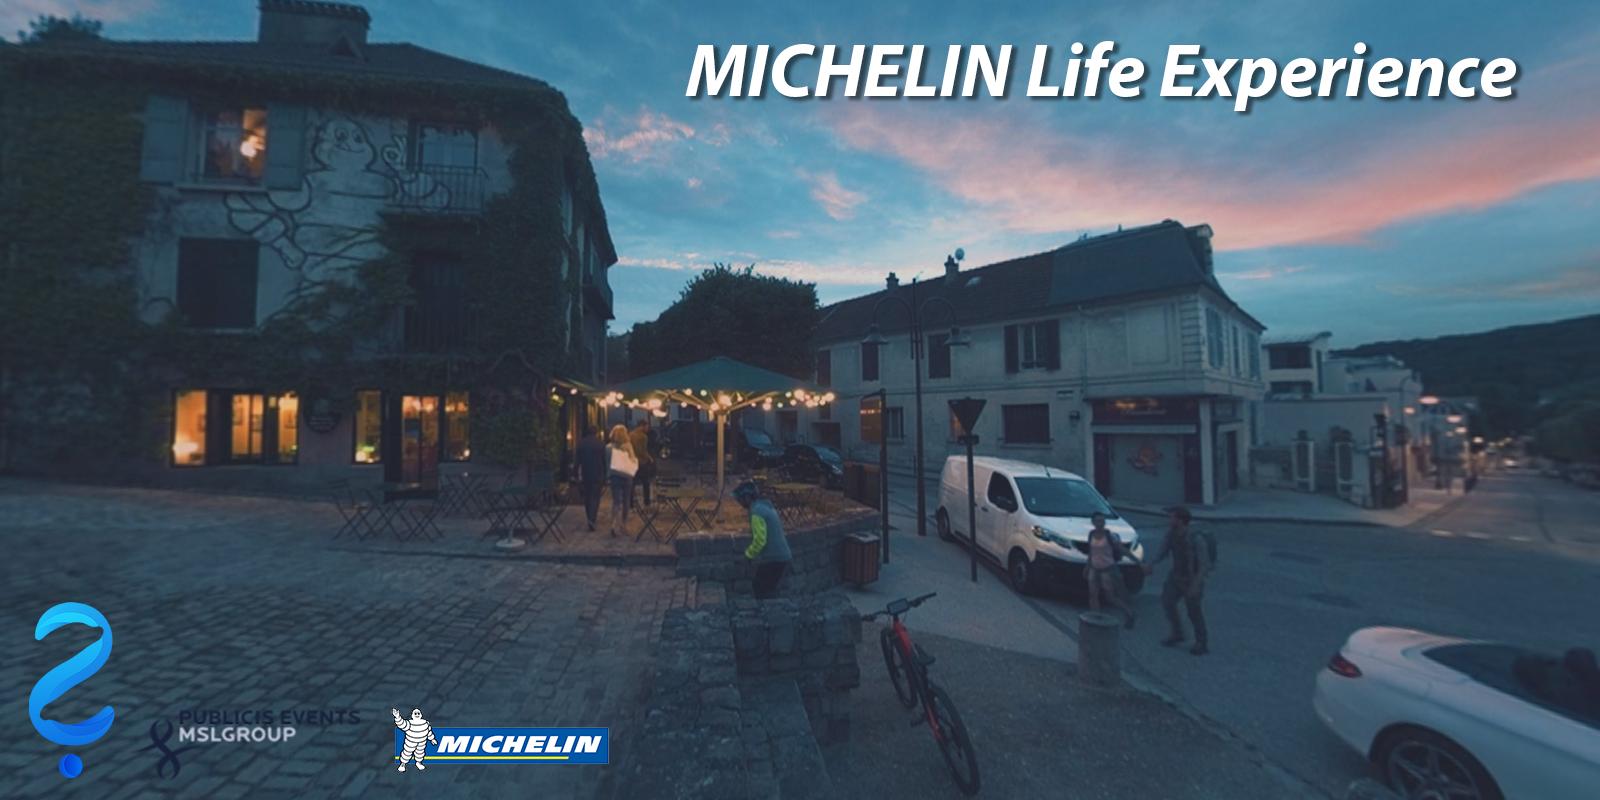 Michelin Logos